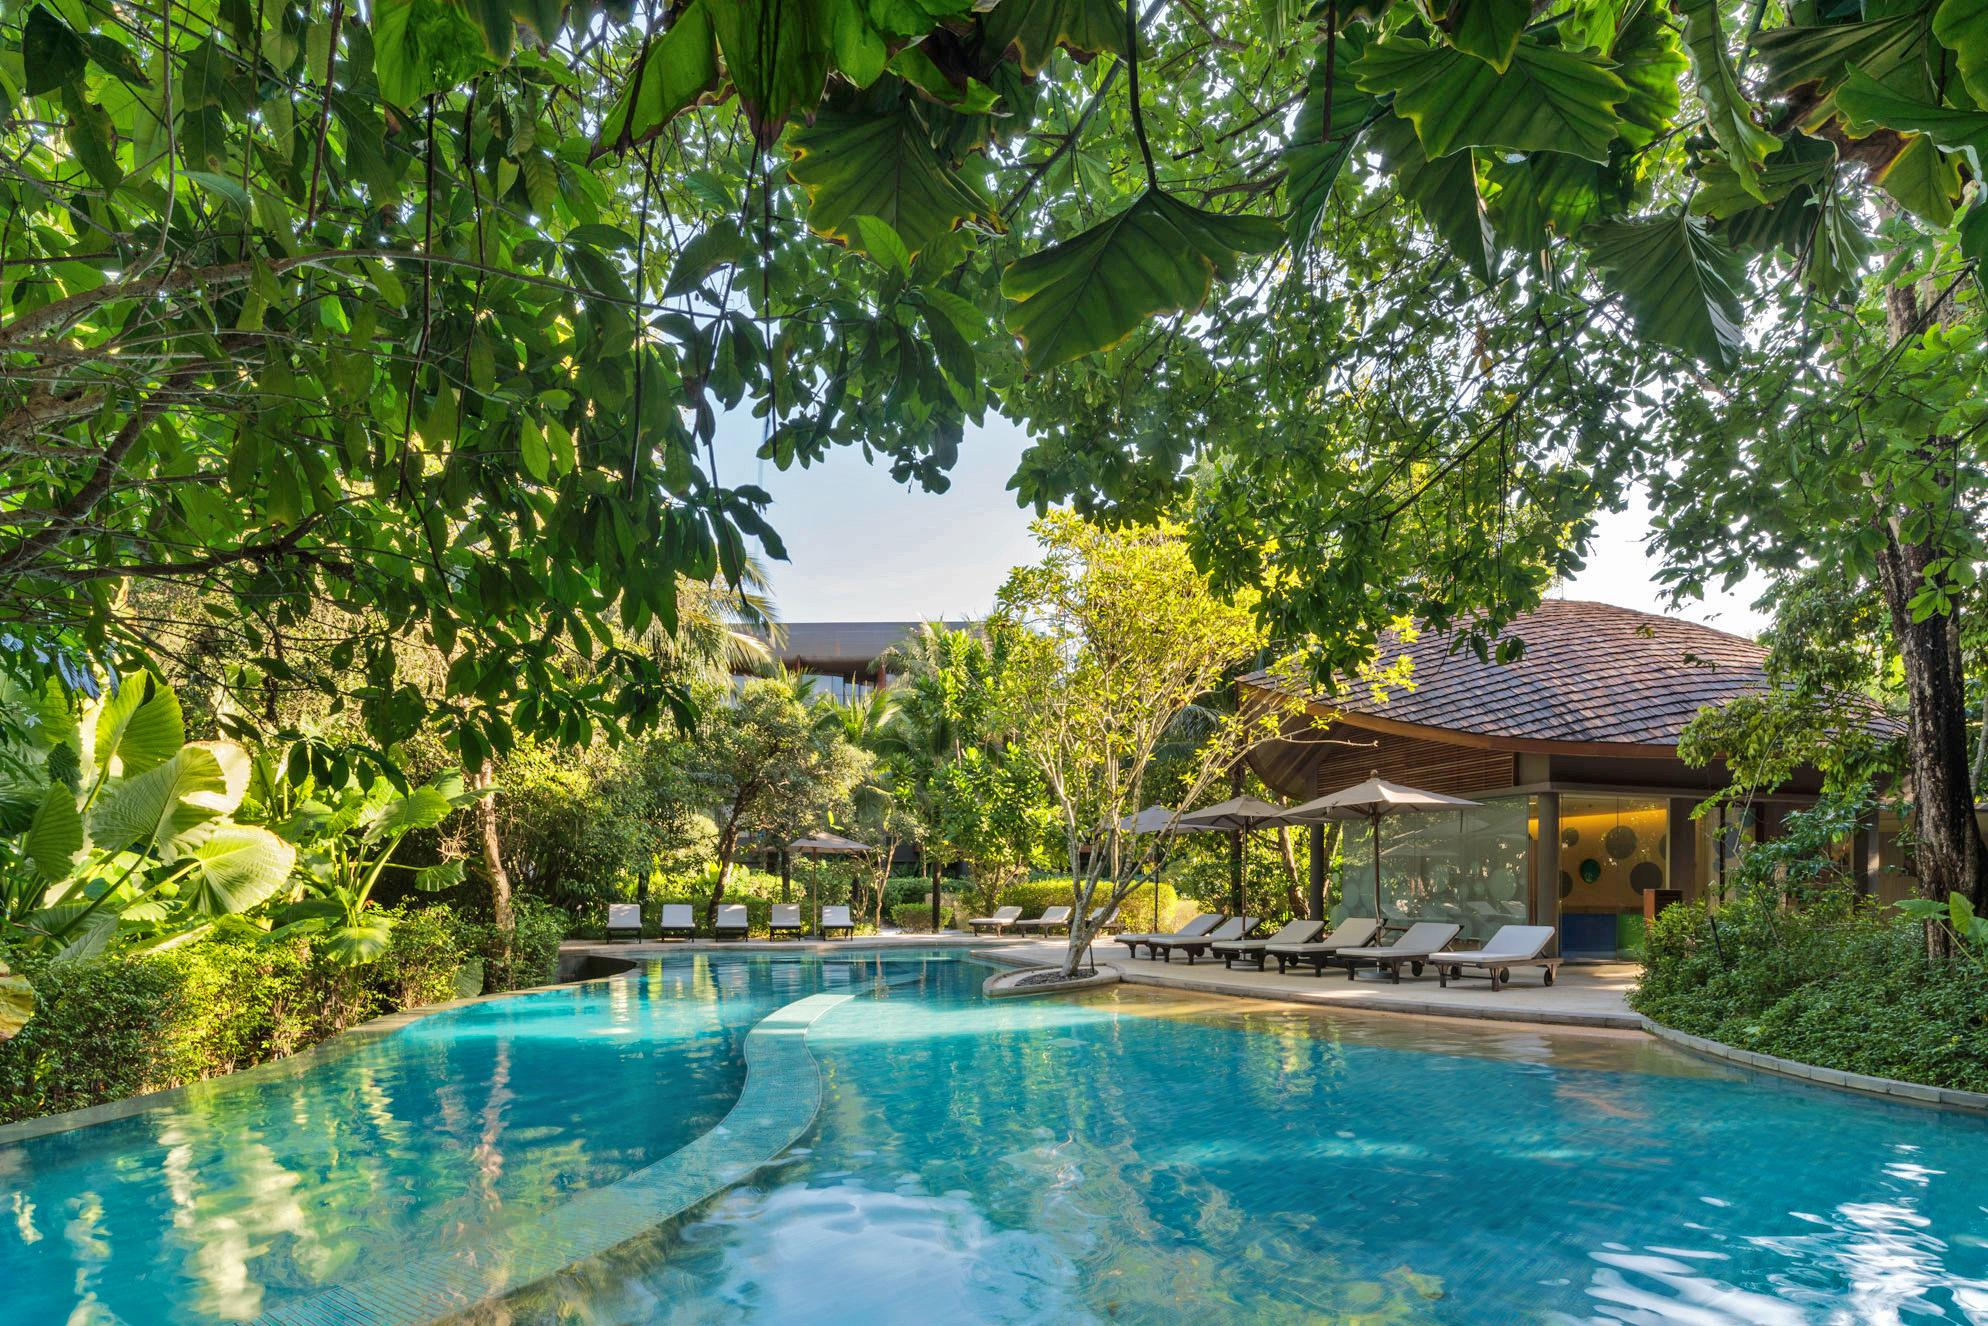 Renaissance Phuket Resort & Spa A Marriott Luxury & Lifestyle Hotel - Phuket